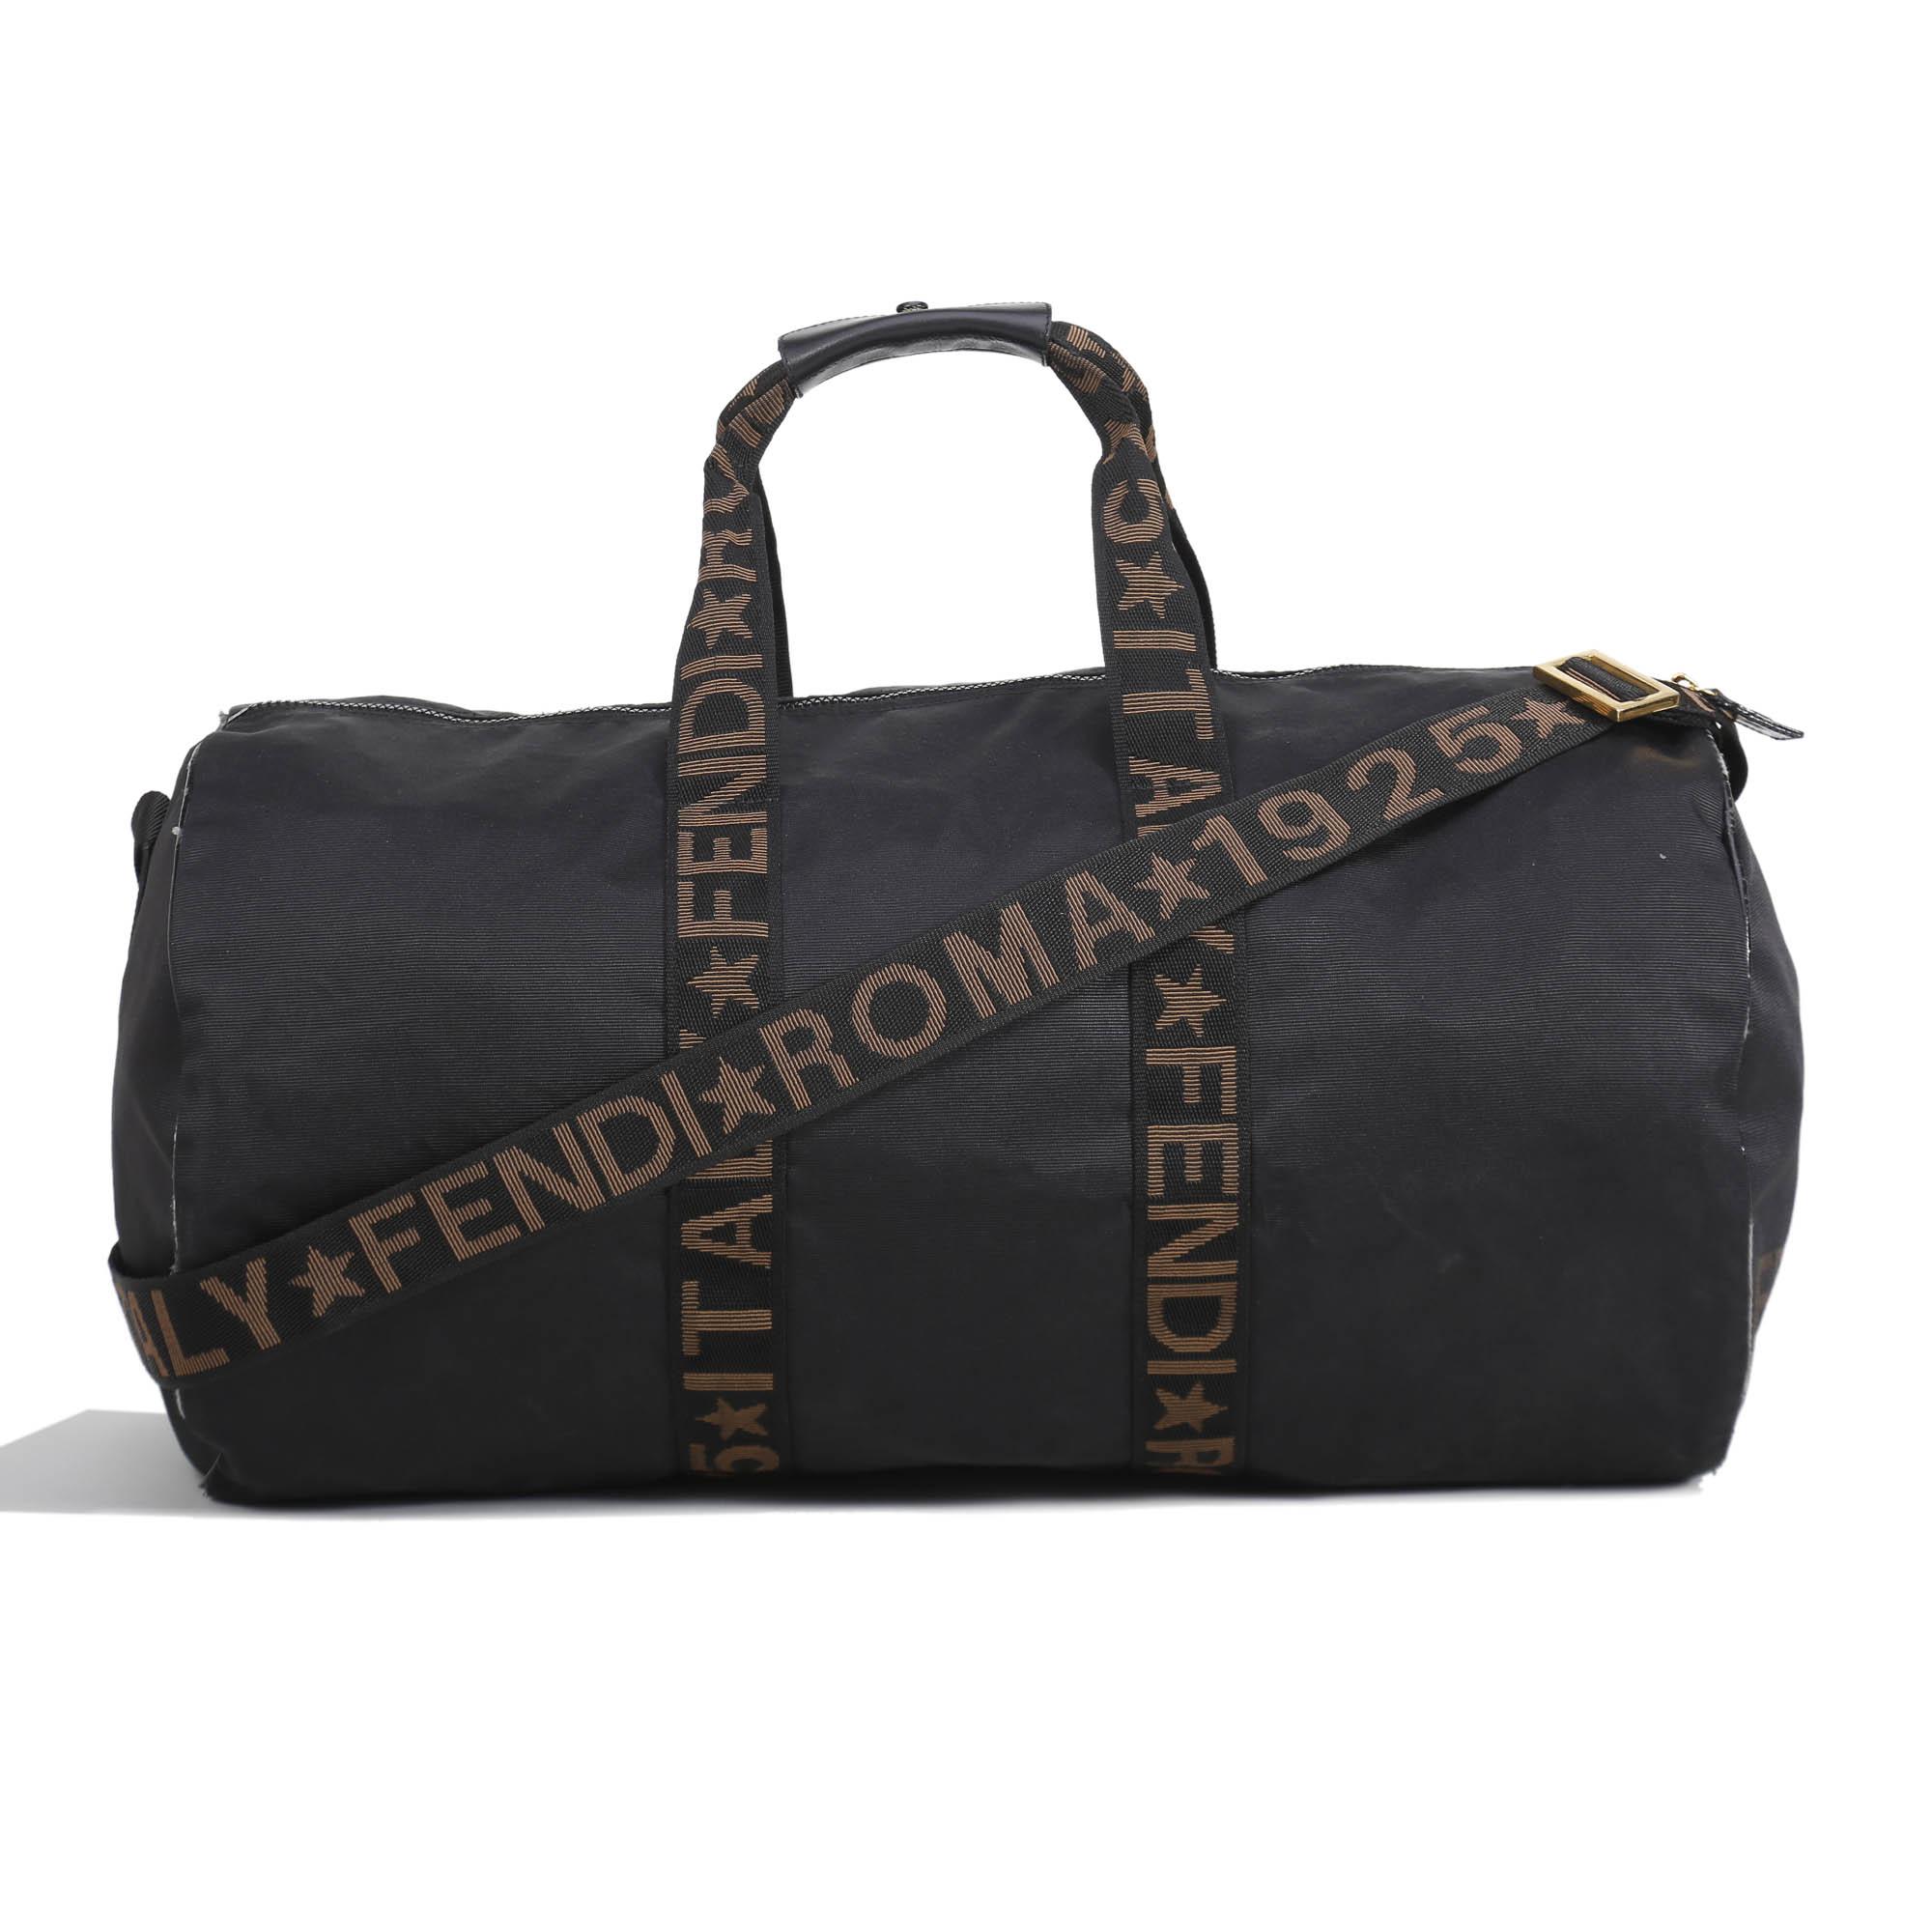 Fendi Black Nylon Carry-on Travel Bag - My Luxury Bargain bfdc3a6c9f95c